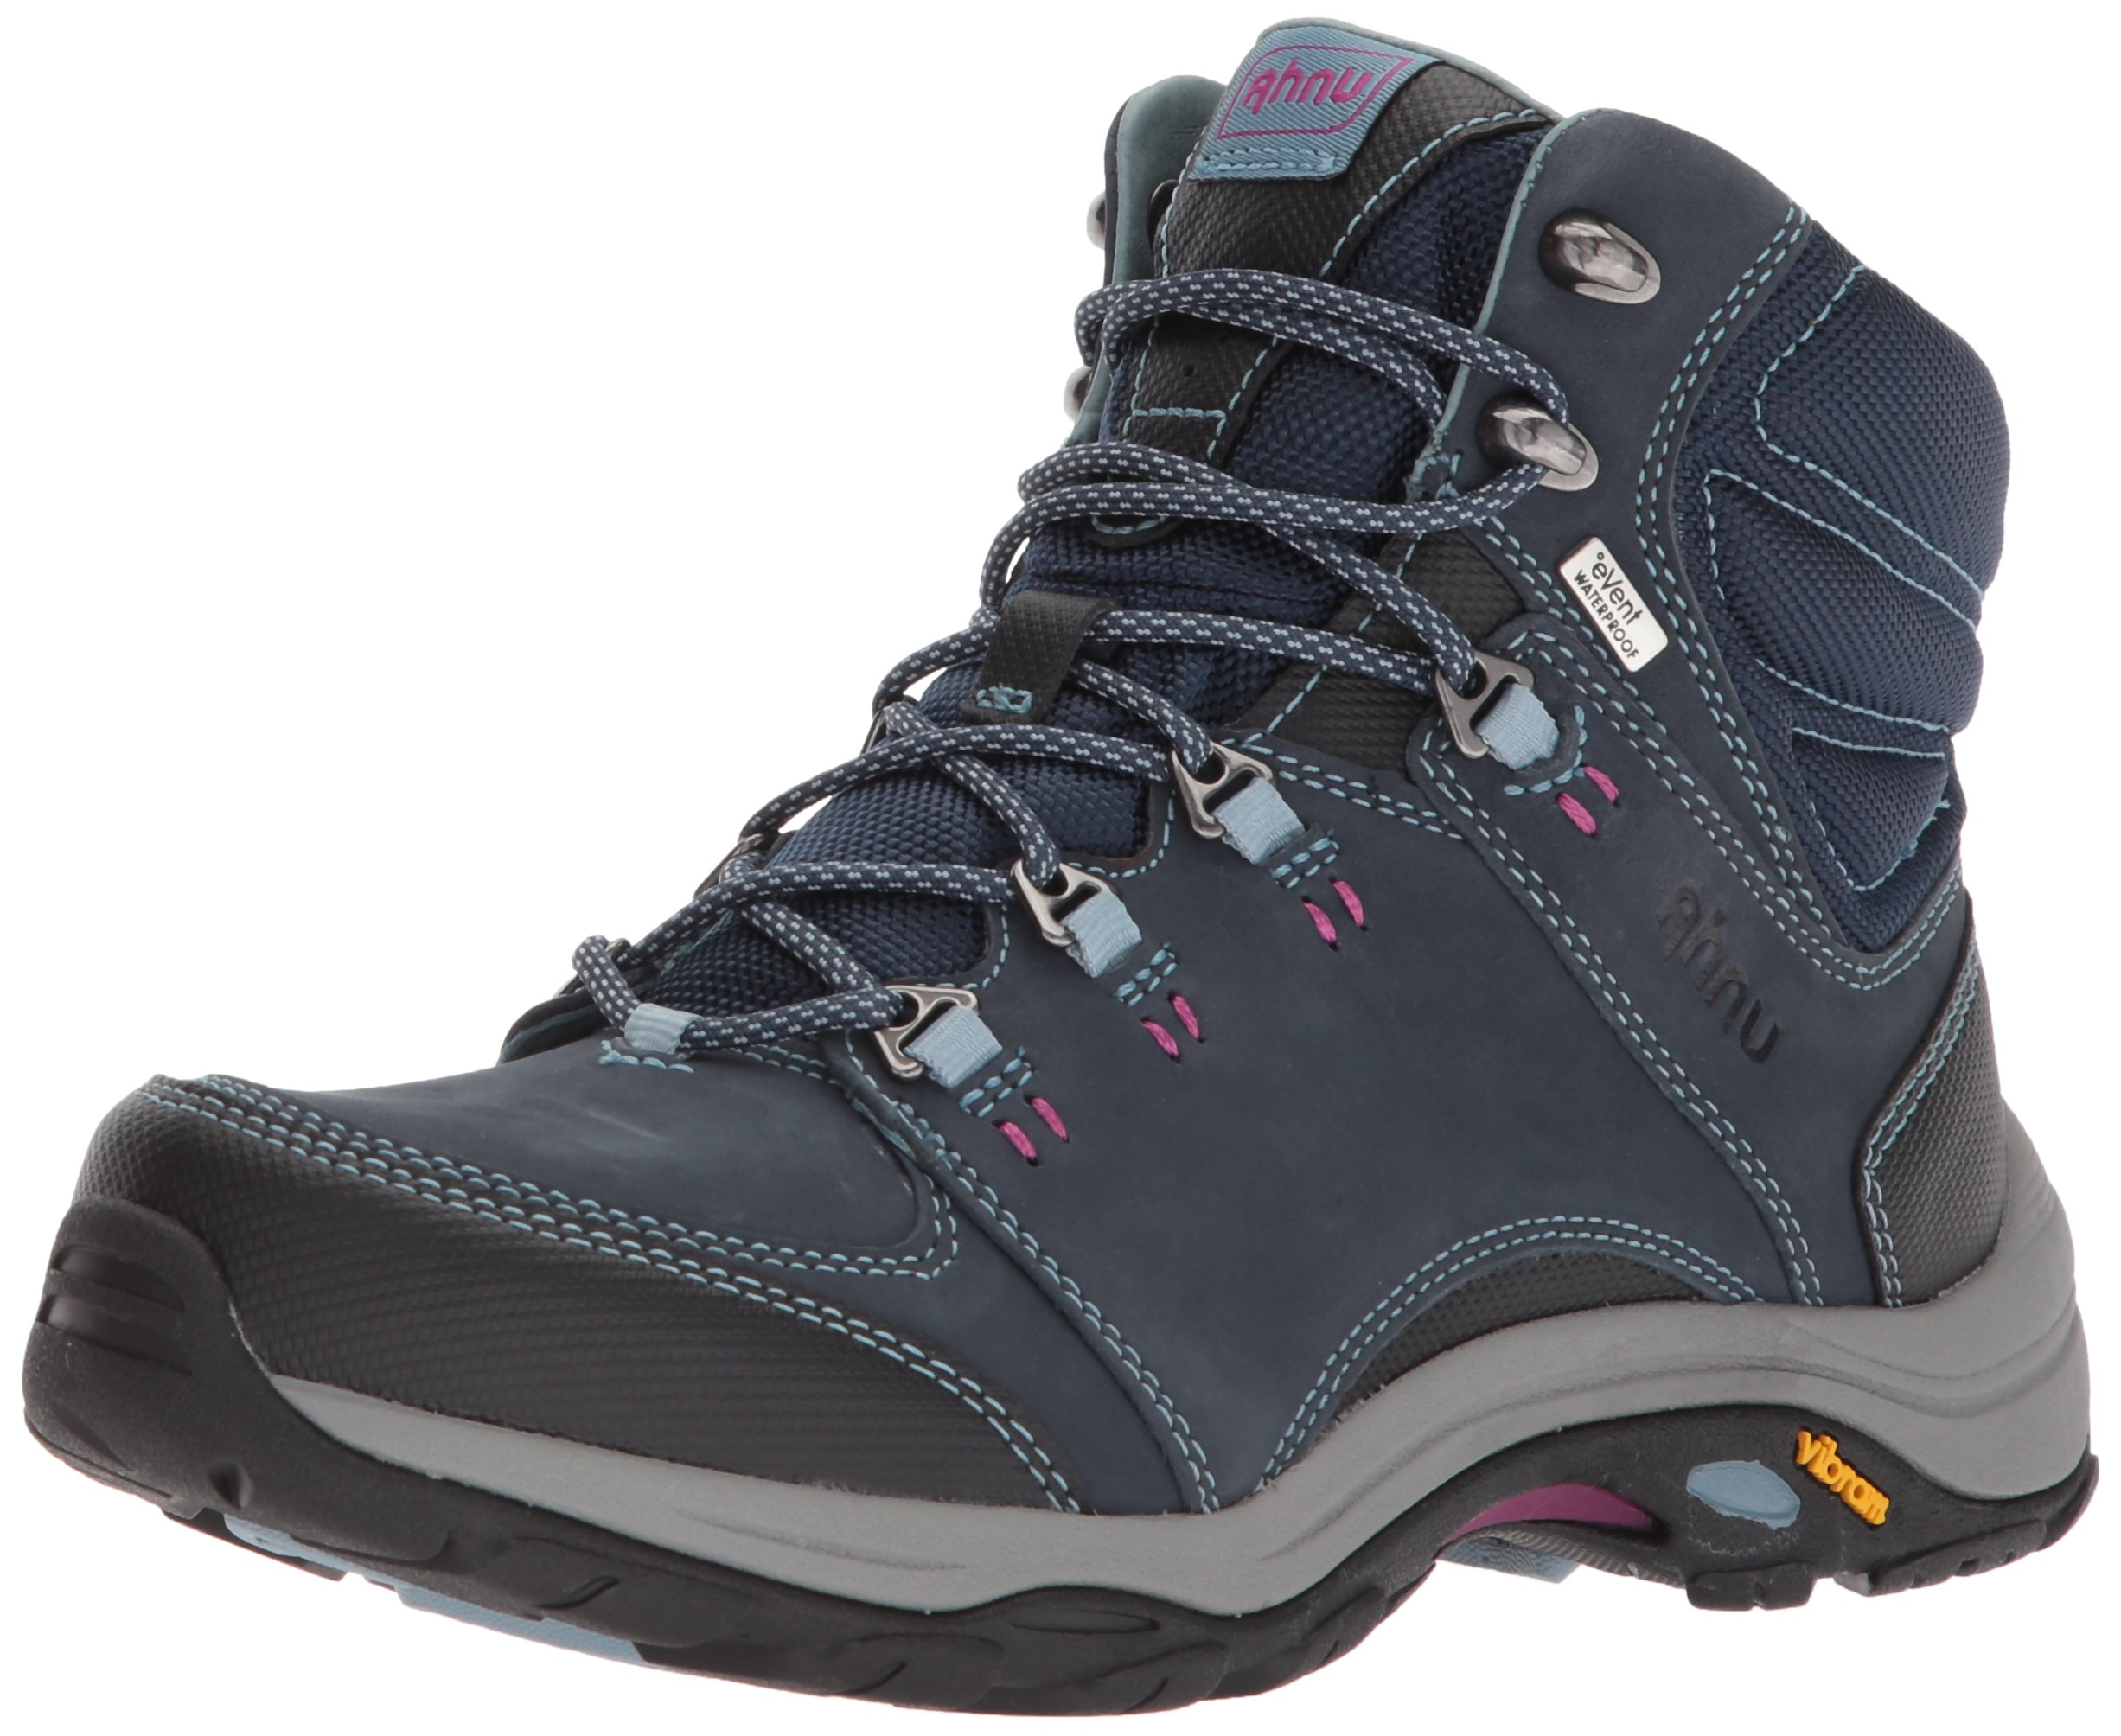 Ahnu Men's W Montara III Boot Event Hiking, Blue Spell, 10.5 Medium US